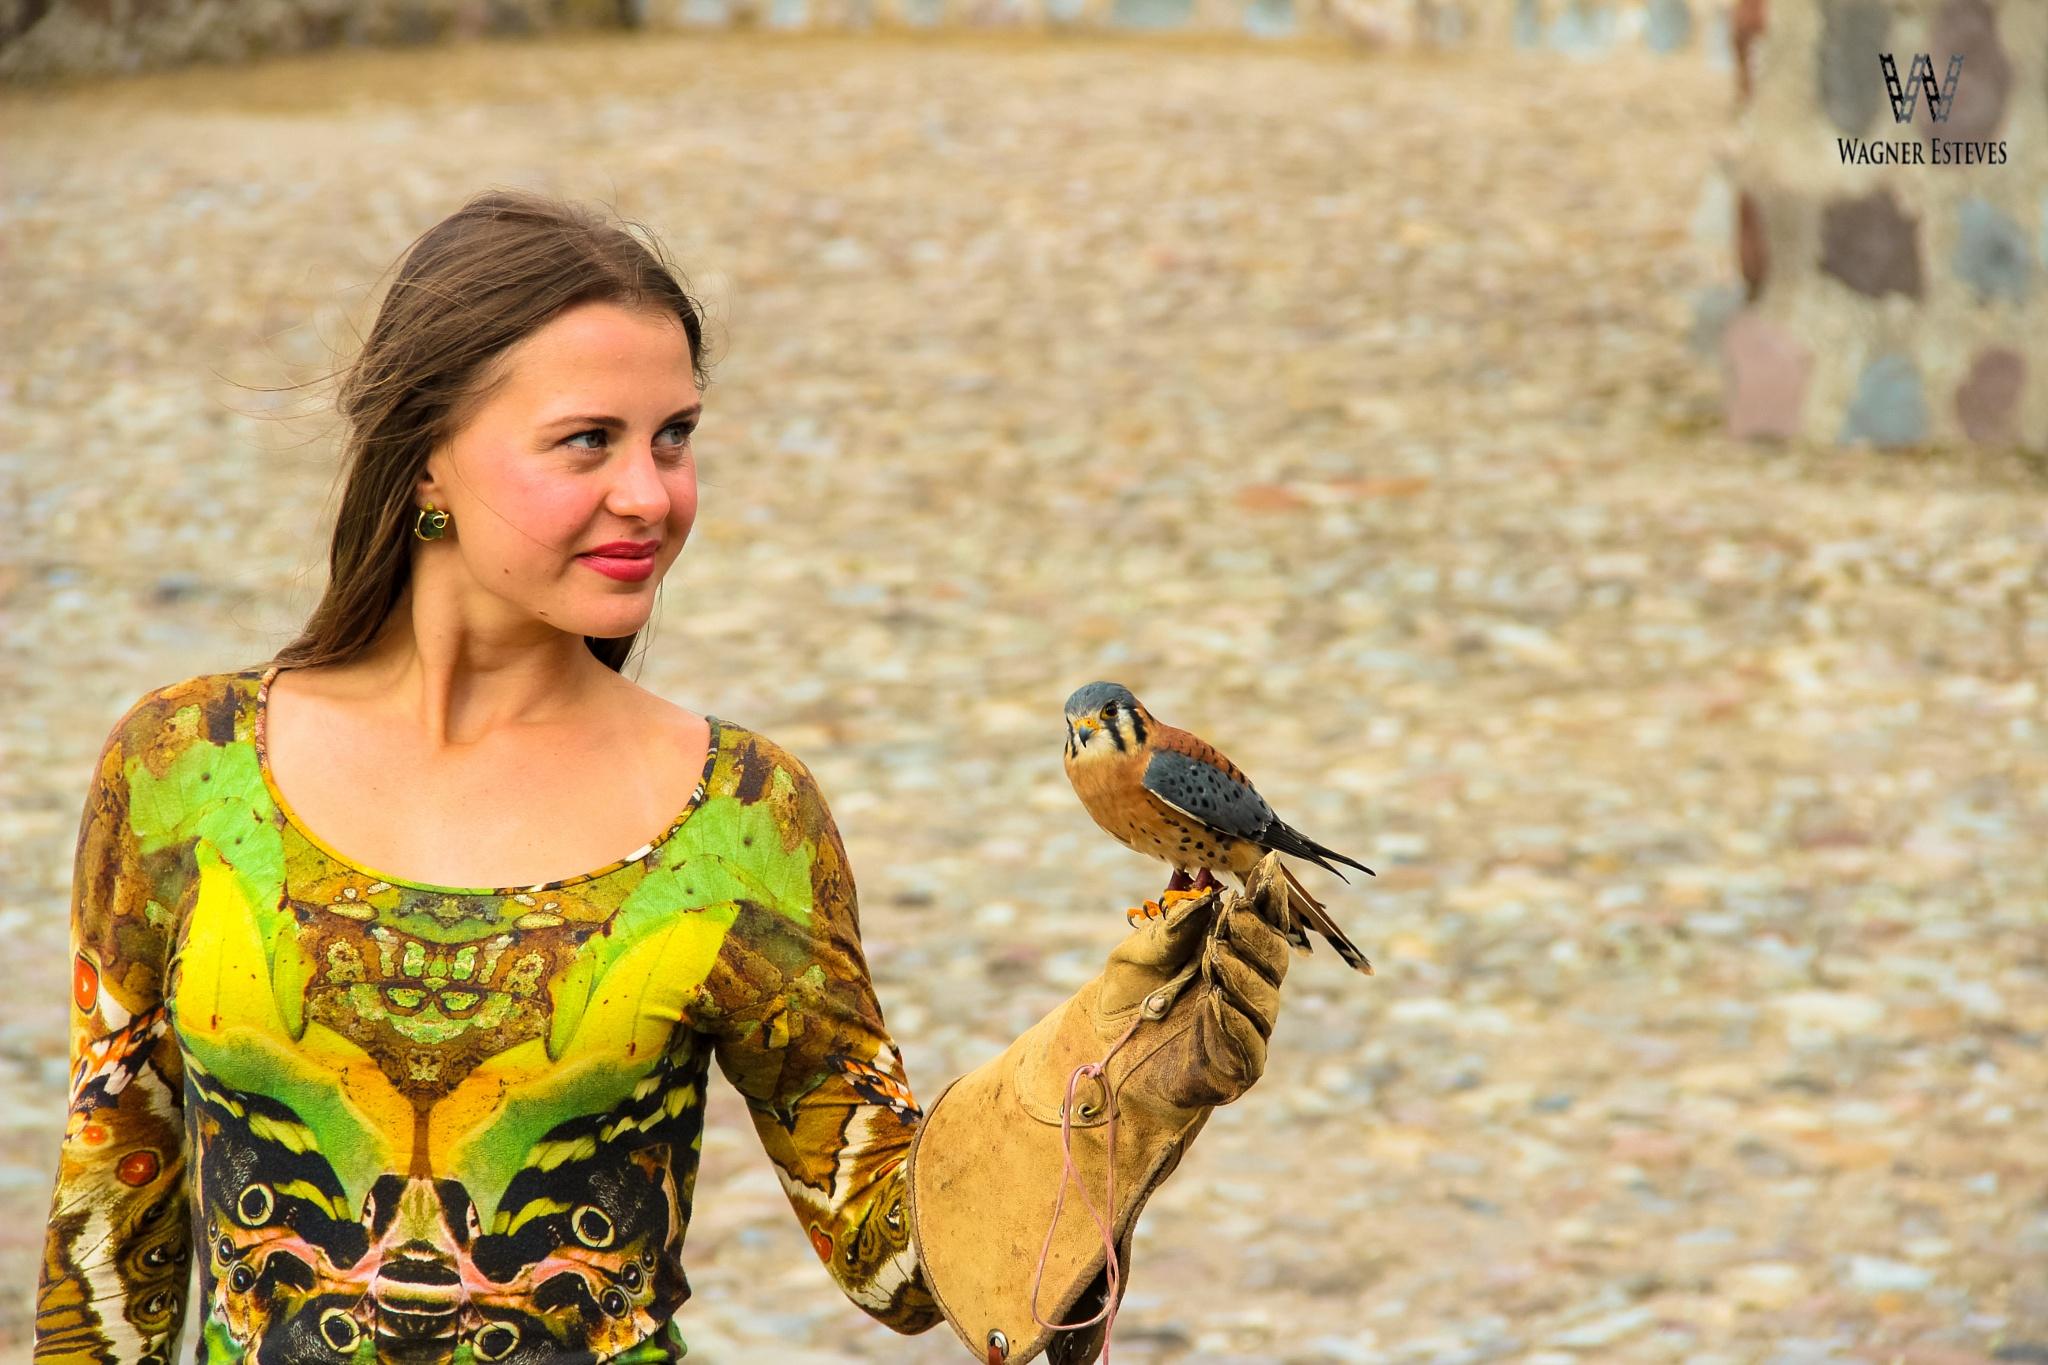 Aves de Rapina by Wagner Esteves